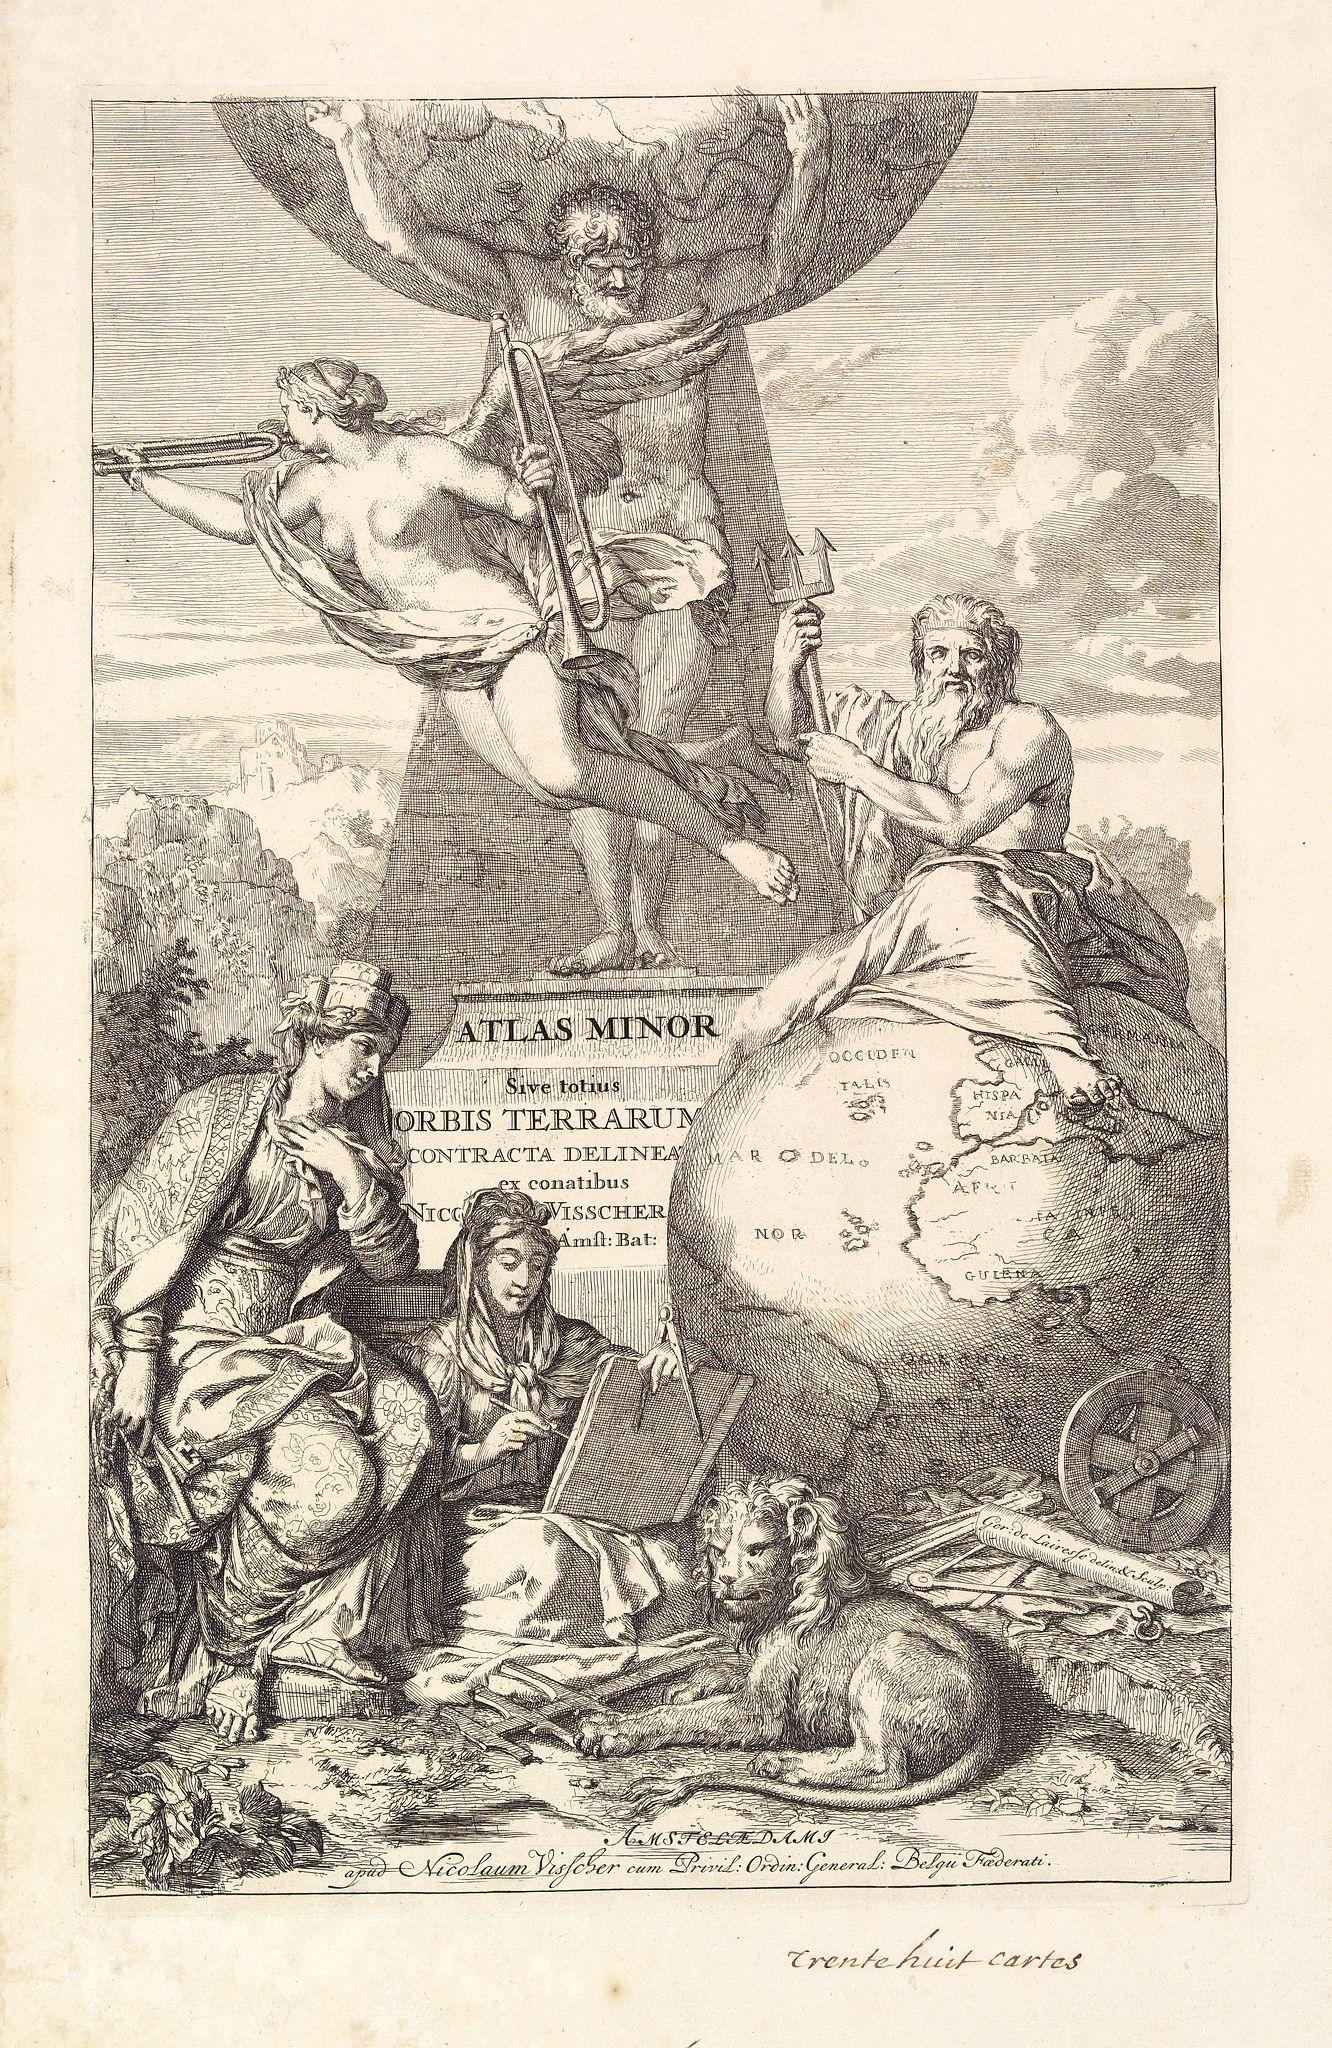 VISSCHER, N. -  Title page: Atlas Minor sive totius Orbis Terrarum. . .